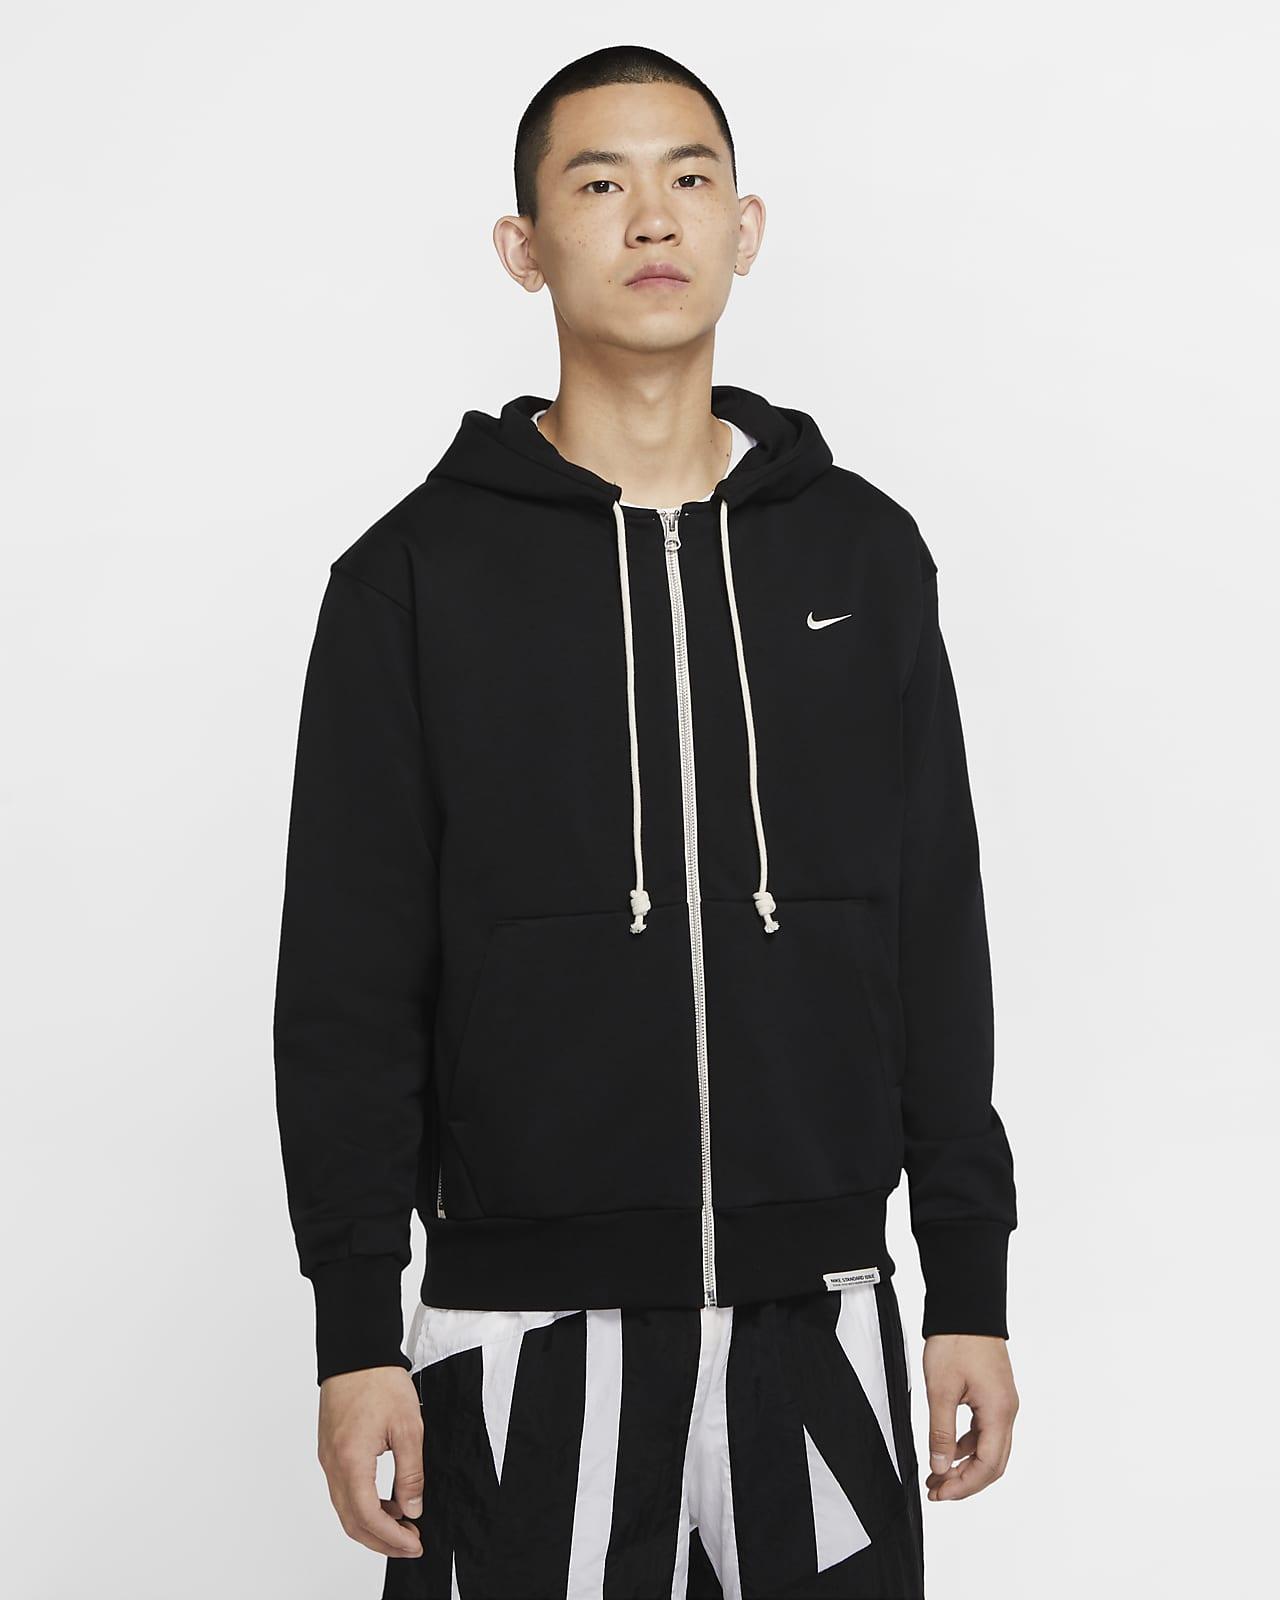 Nike Standard Issue 男子全长拉链开襟篮球连帽衫